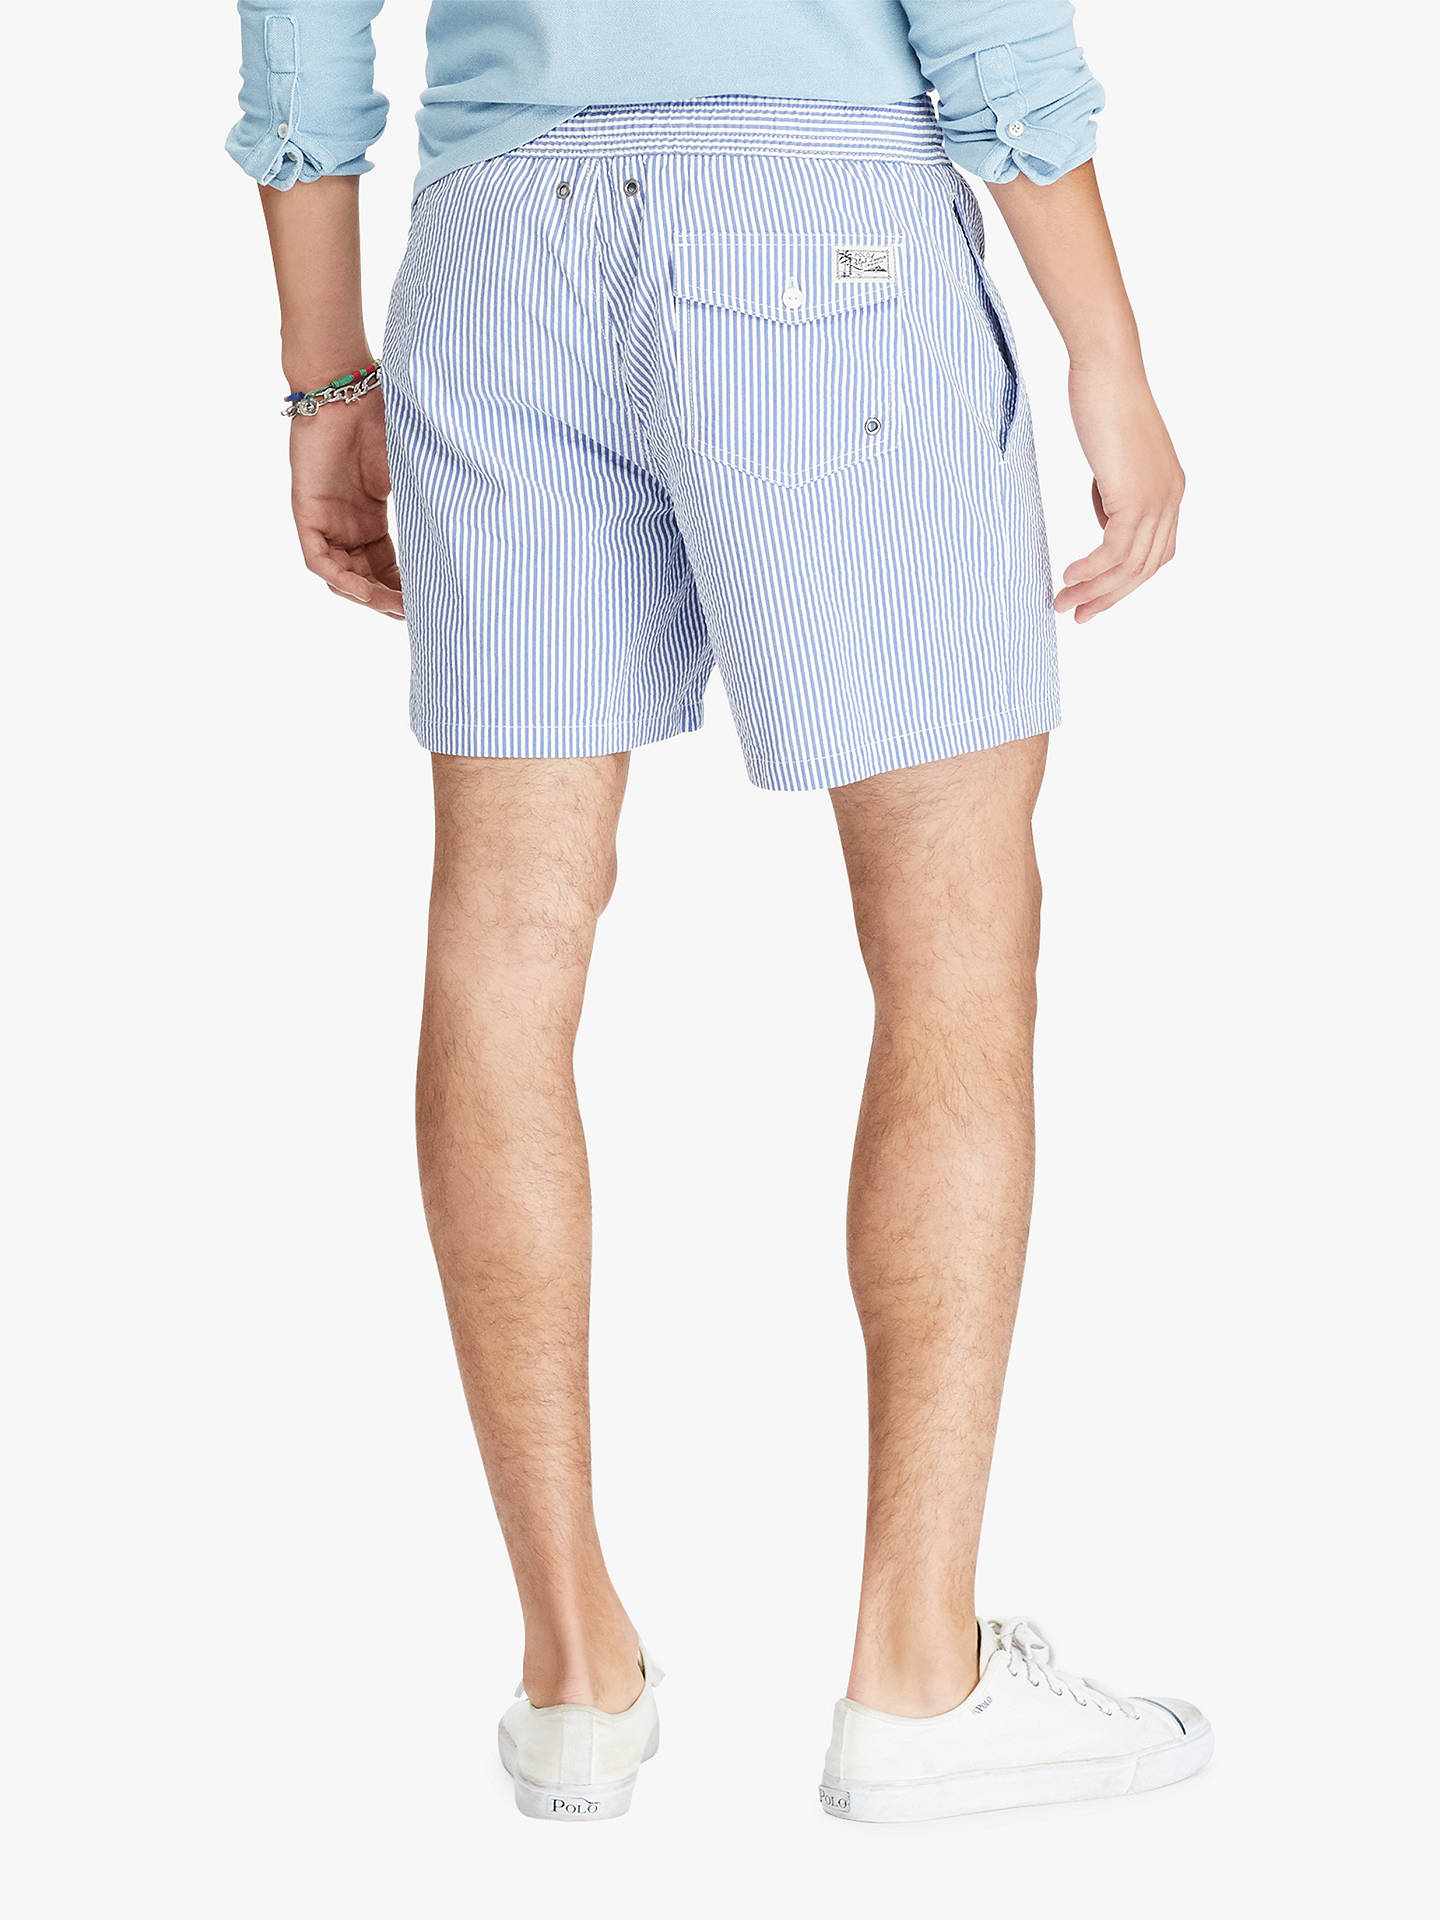 ed08662961 Buy Polo Ralph Lauren Seersucker Stripe Swim Shorts, Blue, S Online at  johnlewis.